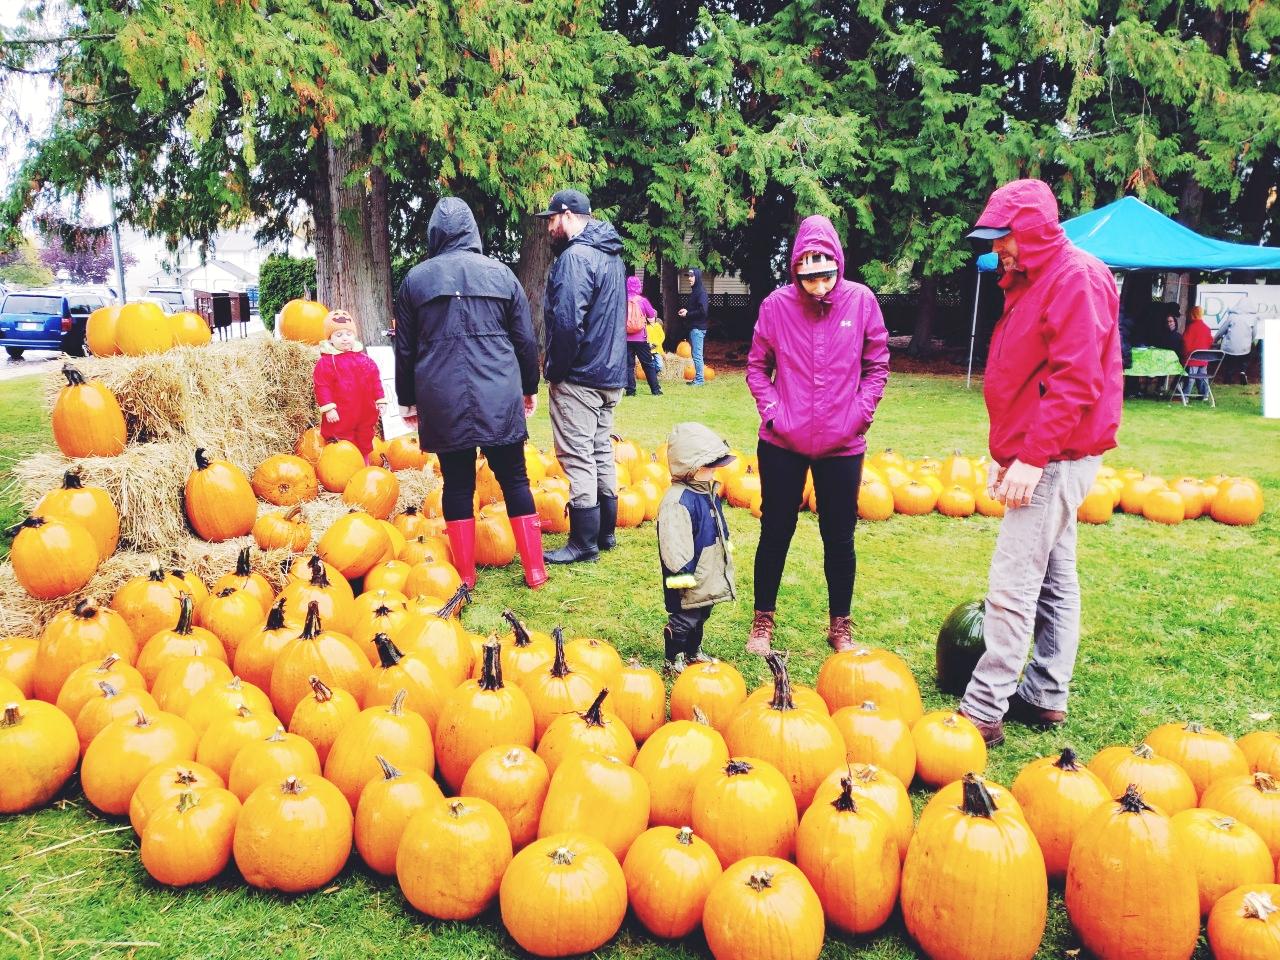 North Nanaimo Pumpkin Patch is an annual fundraiser put on by Dawn Walton & Associates